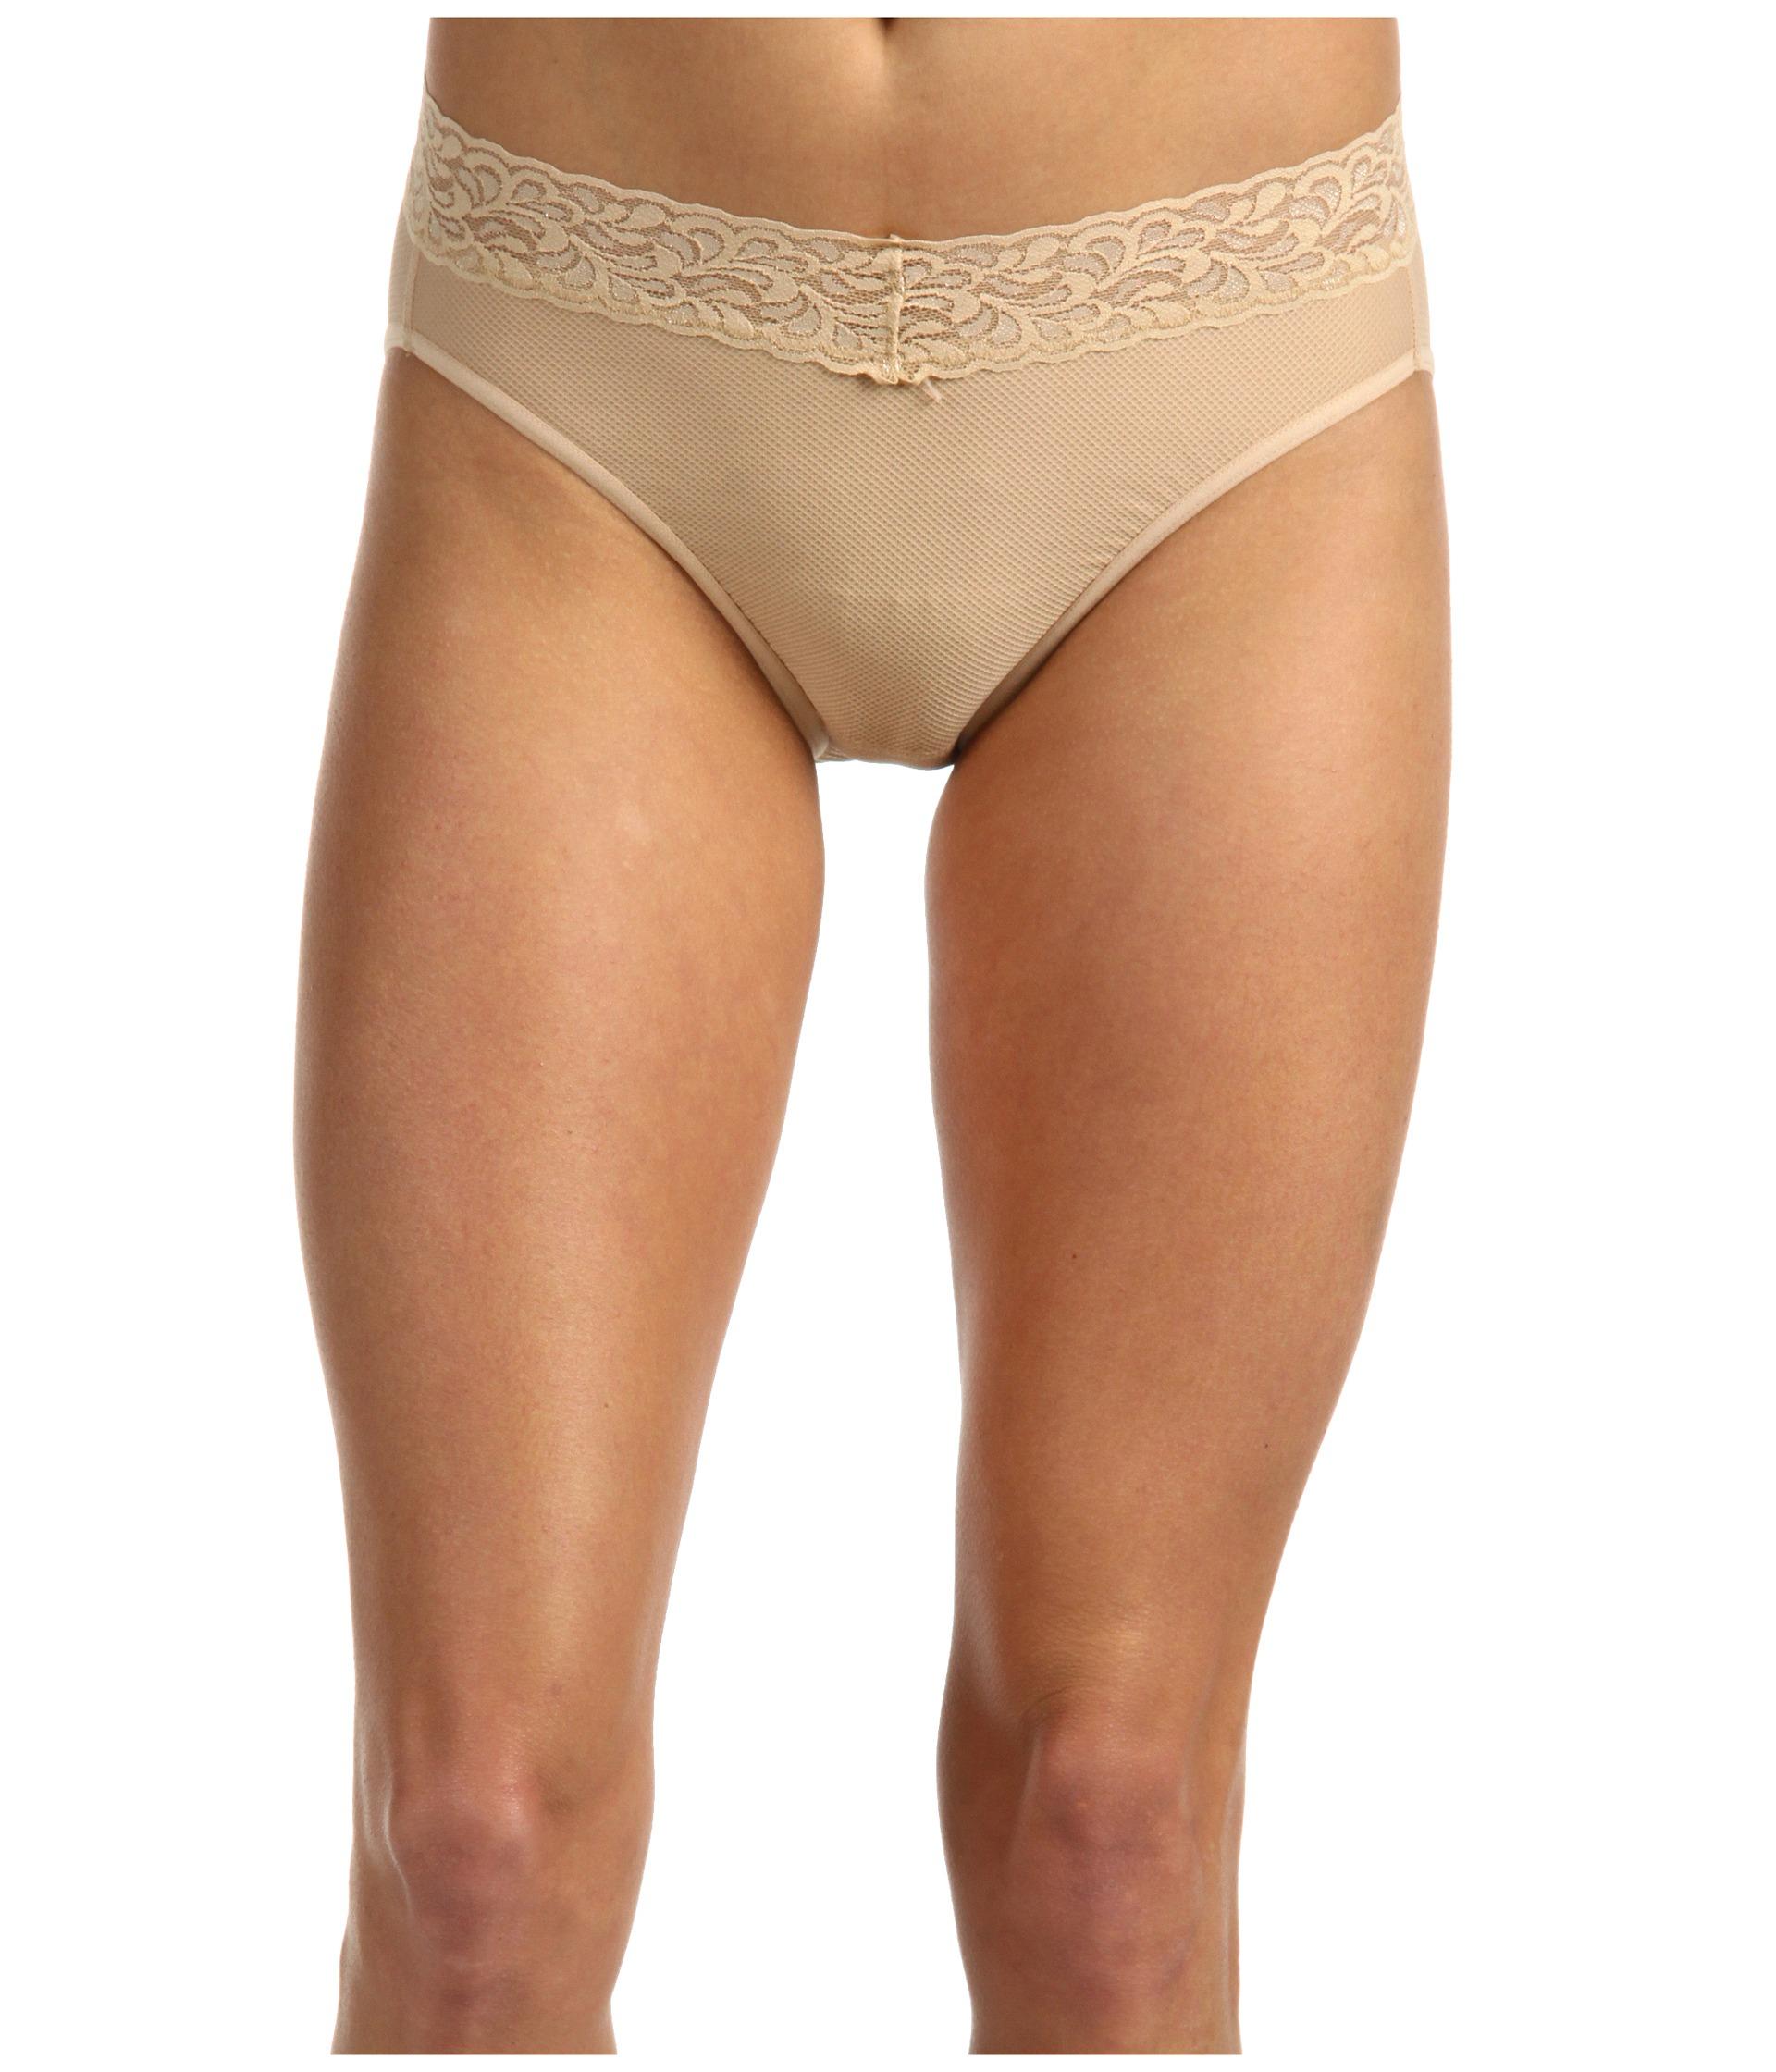 Exofficio Give N Go Lacy Bikini | Shipped Free at Zappos